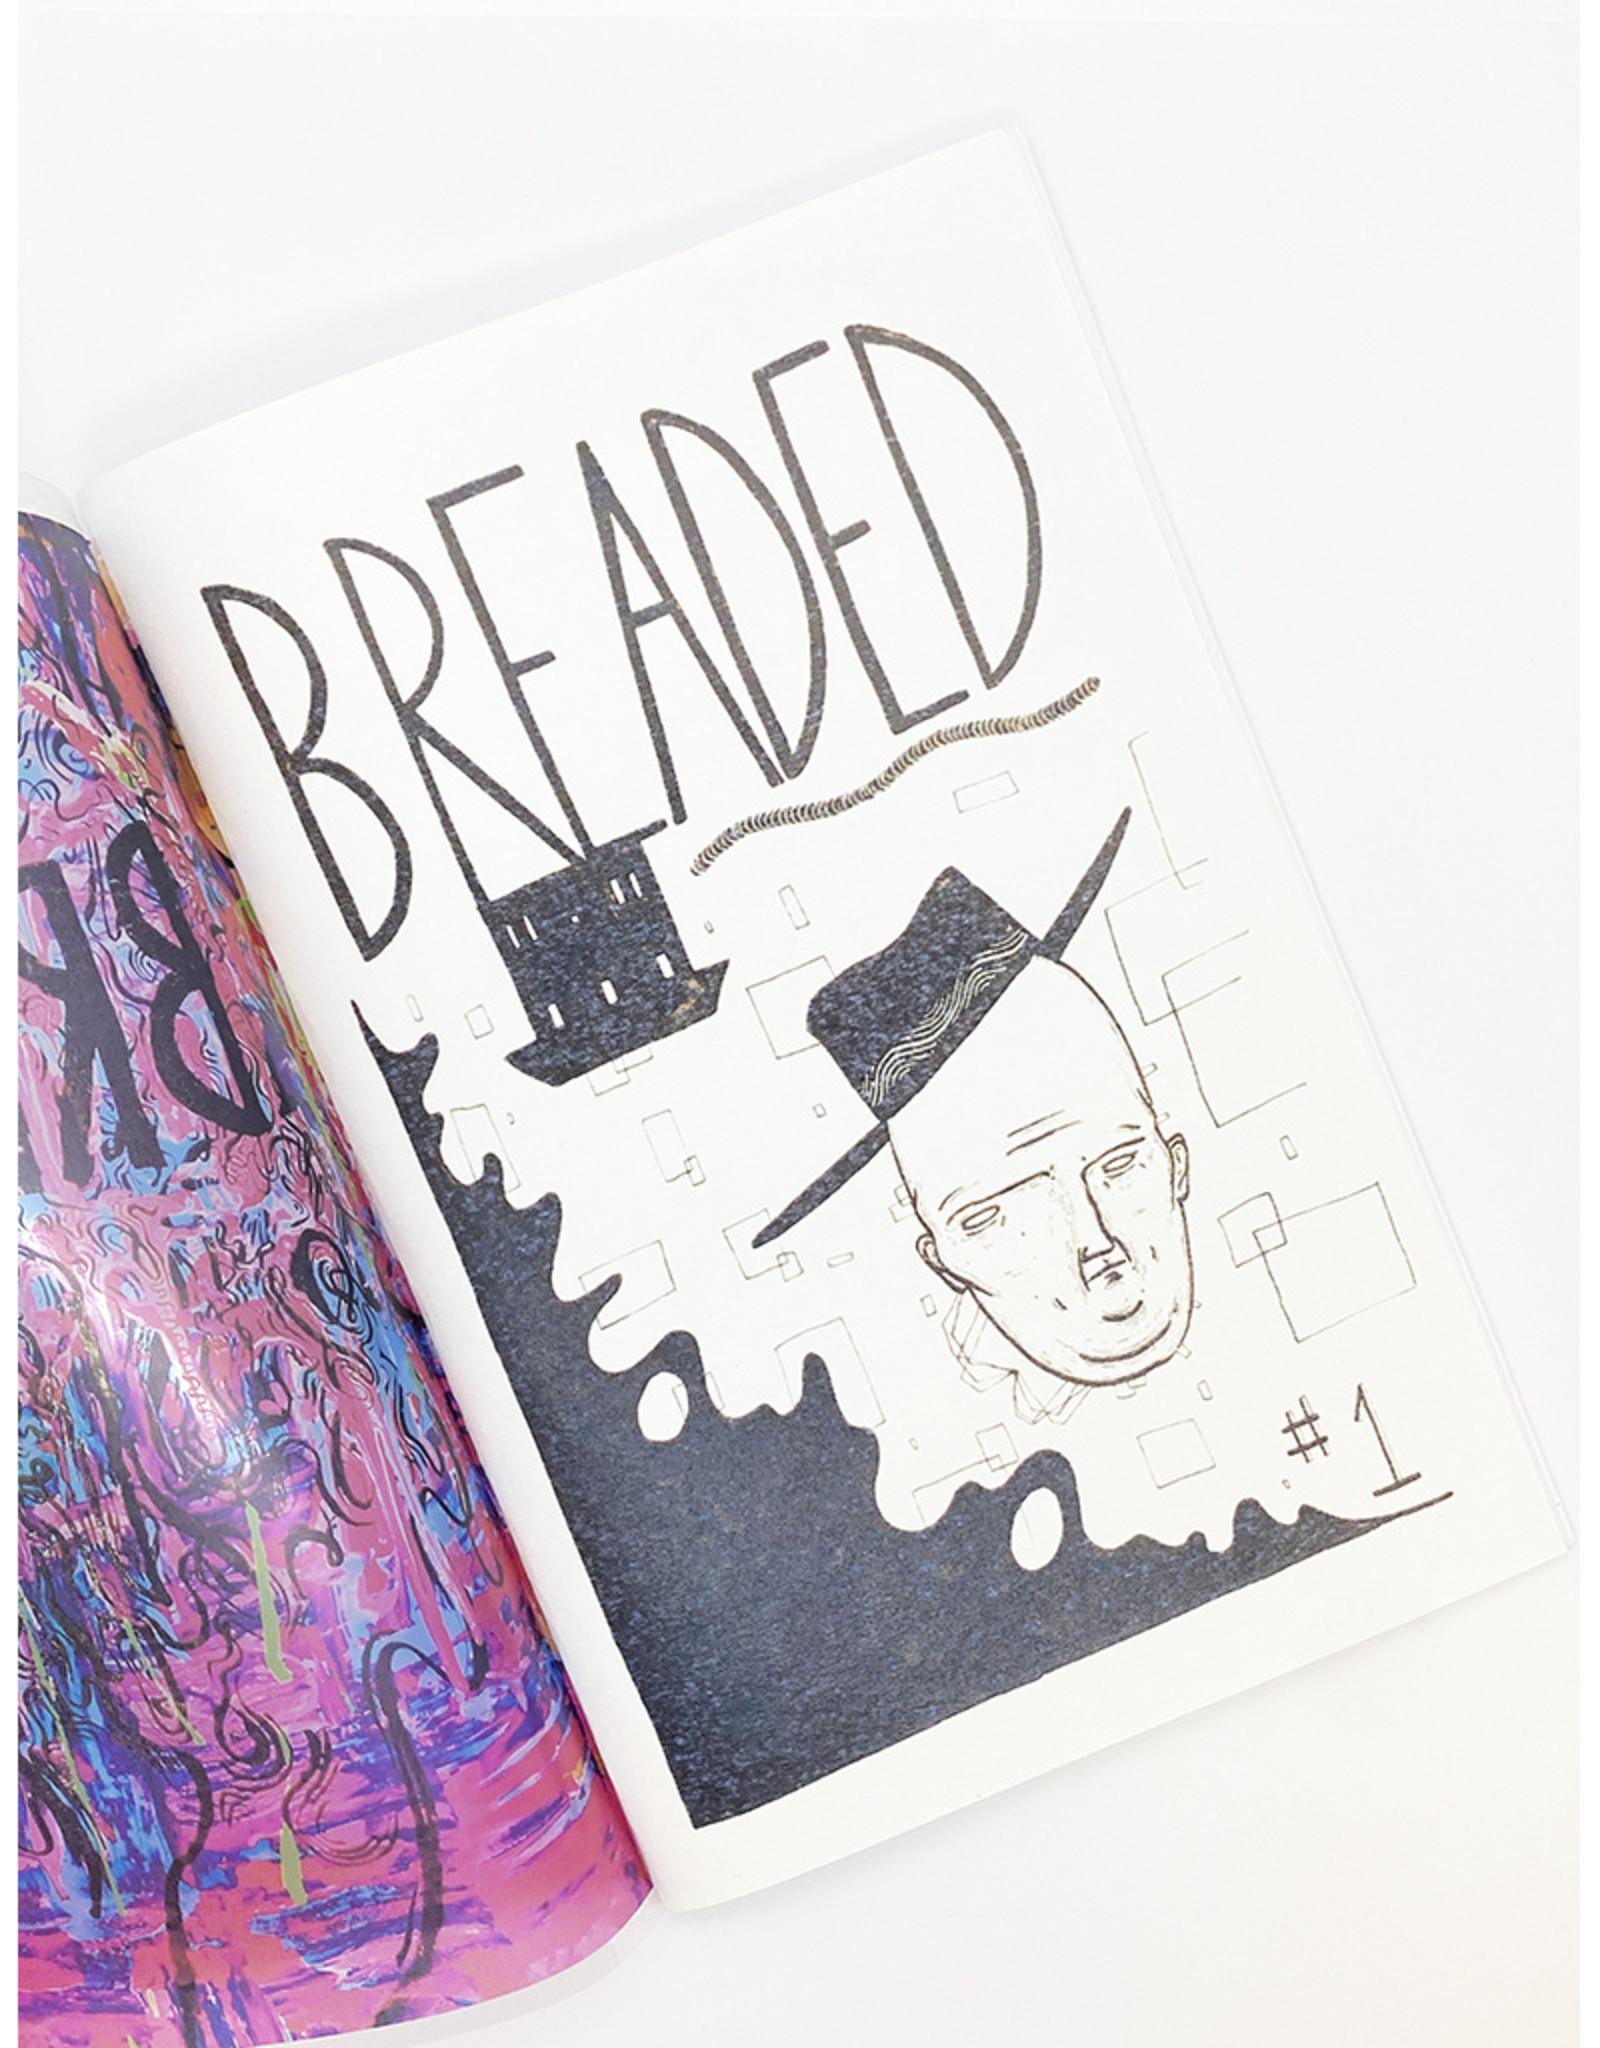 Bread Nugent Breaded Zine Vol. 1